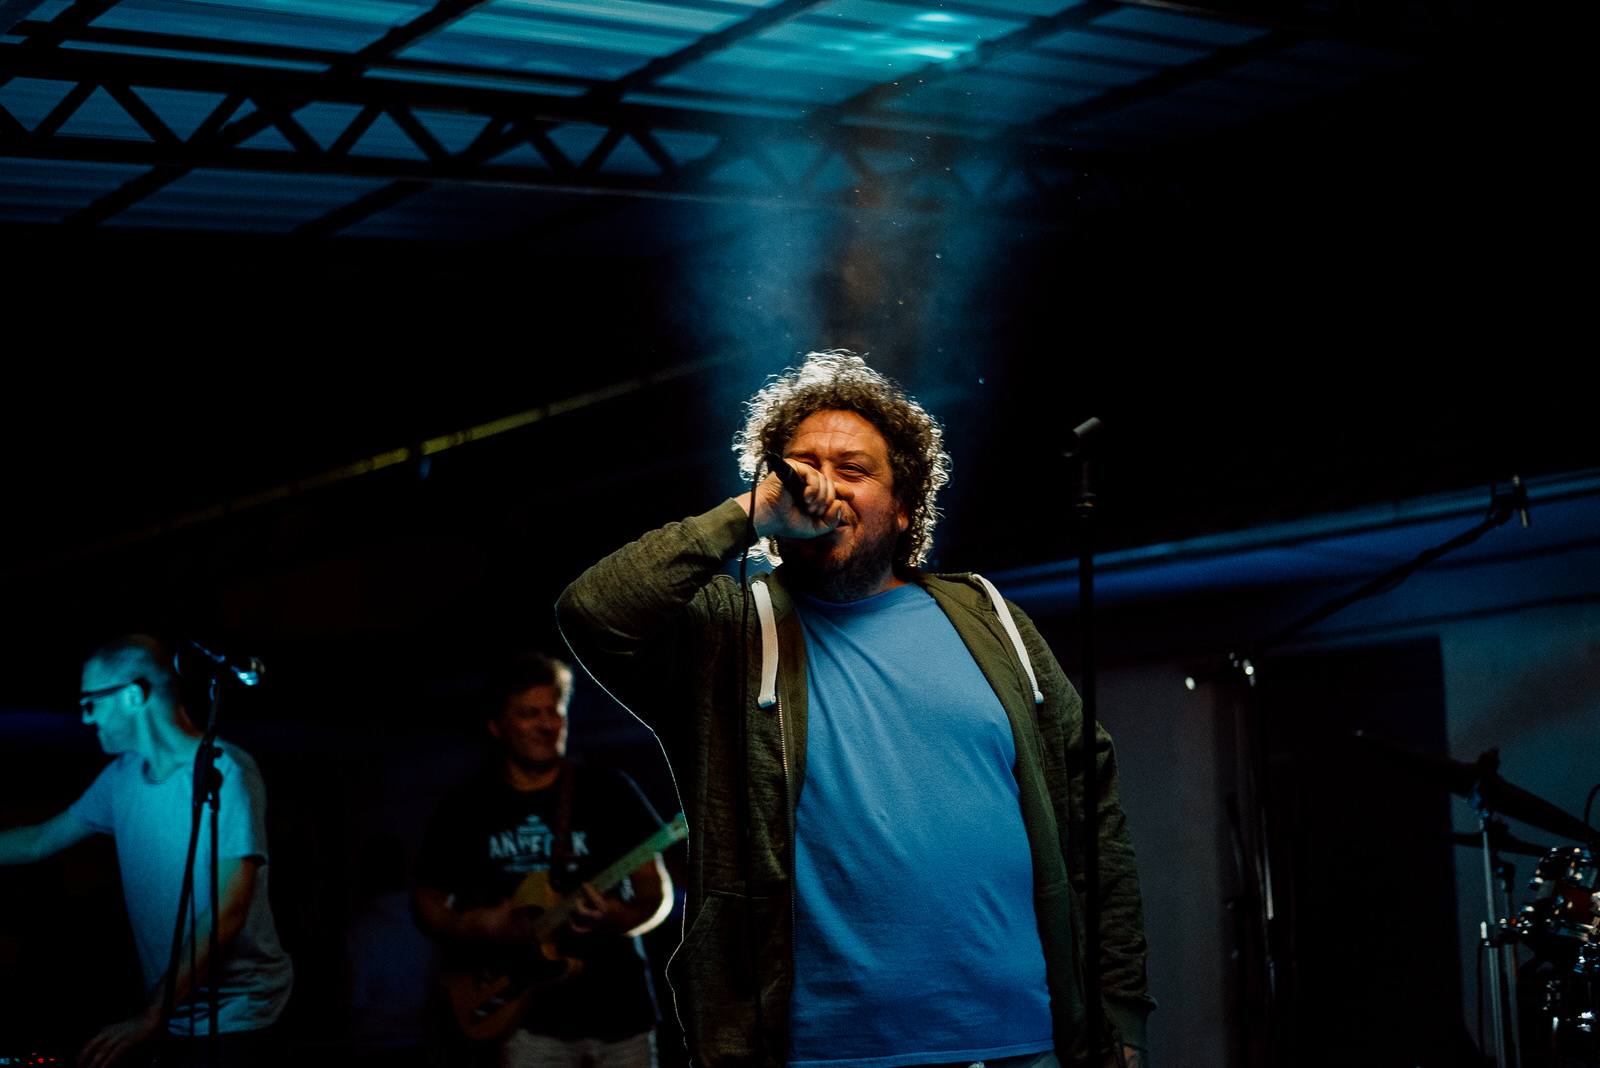 likaclub_grocks-2019_tbf-barbara-munjas-13